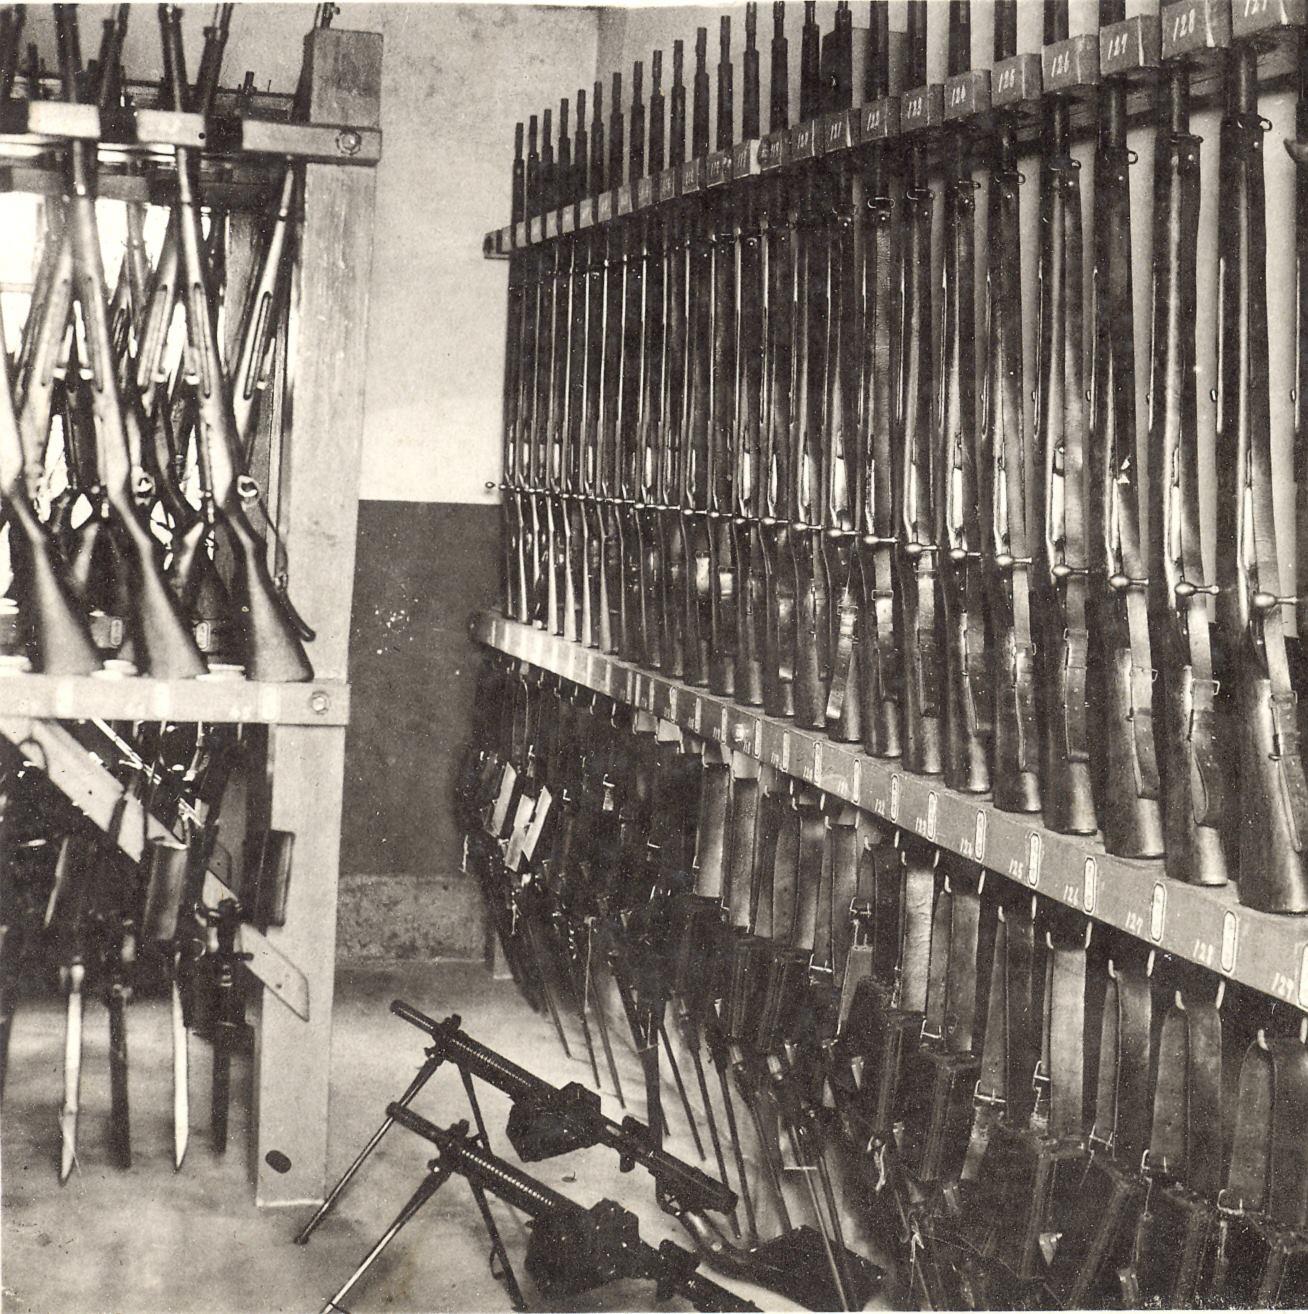 私立淡水中學(淡江高中)的228事件始末與真相 Tamsui weapon firearms in 228 Incident of Taiwan 02